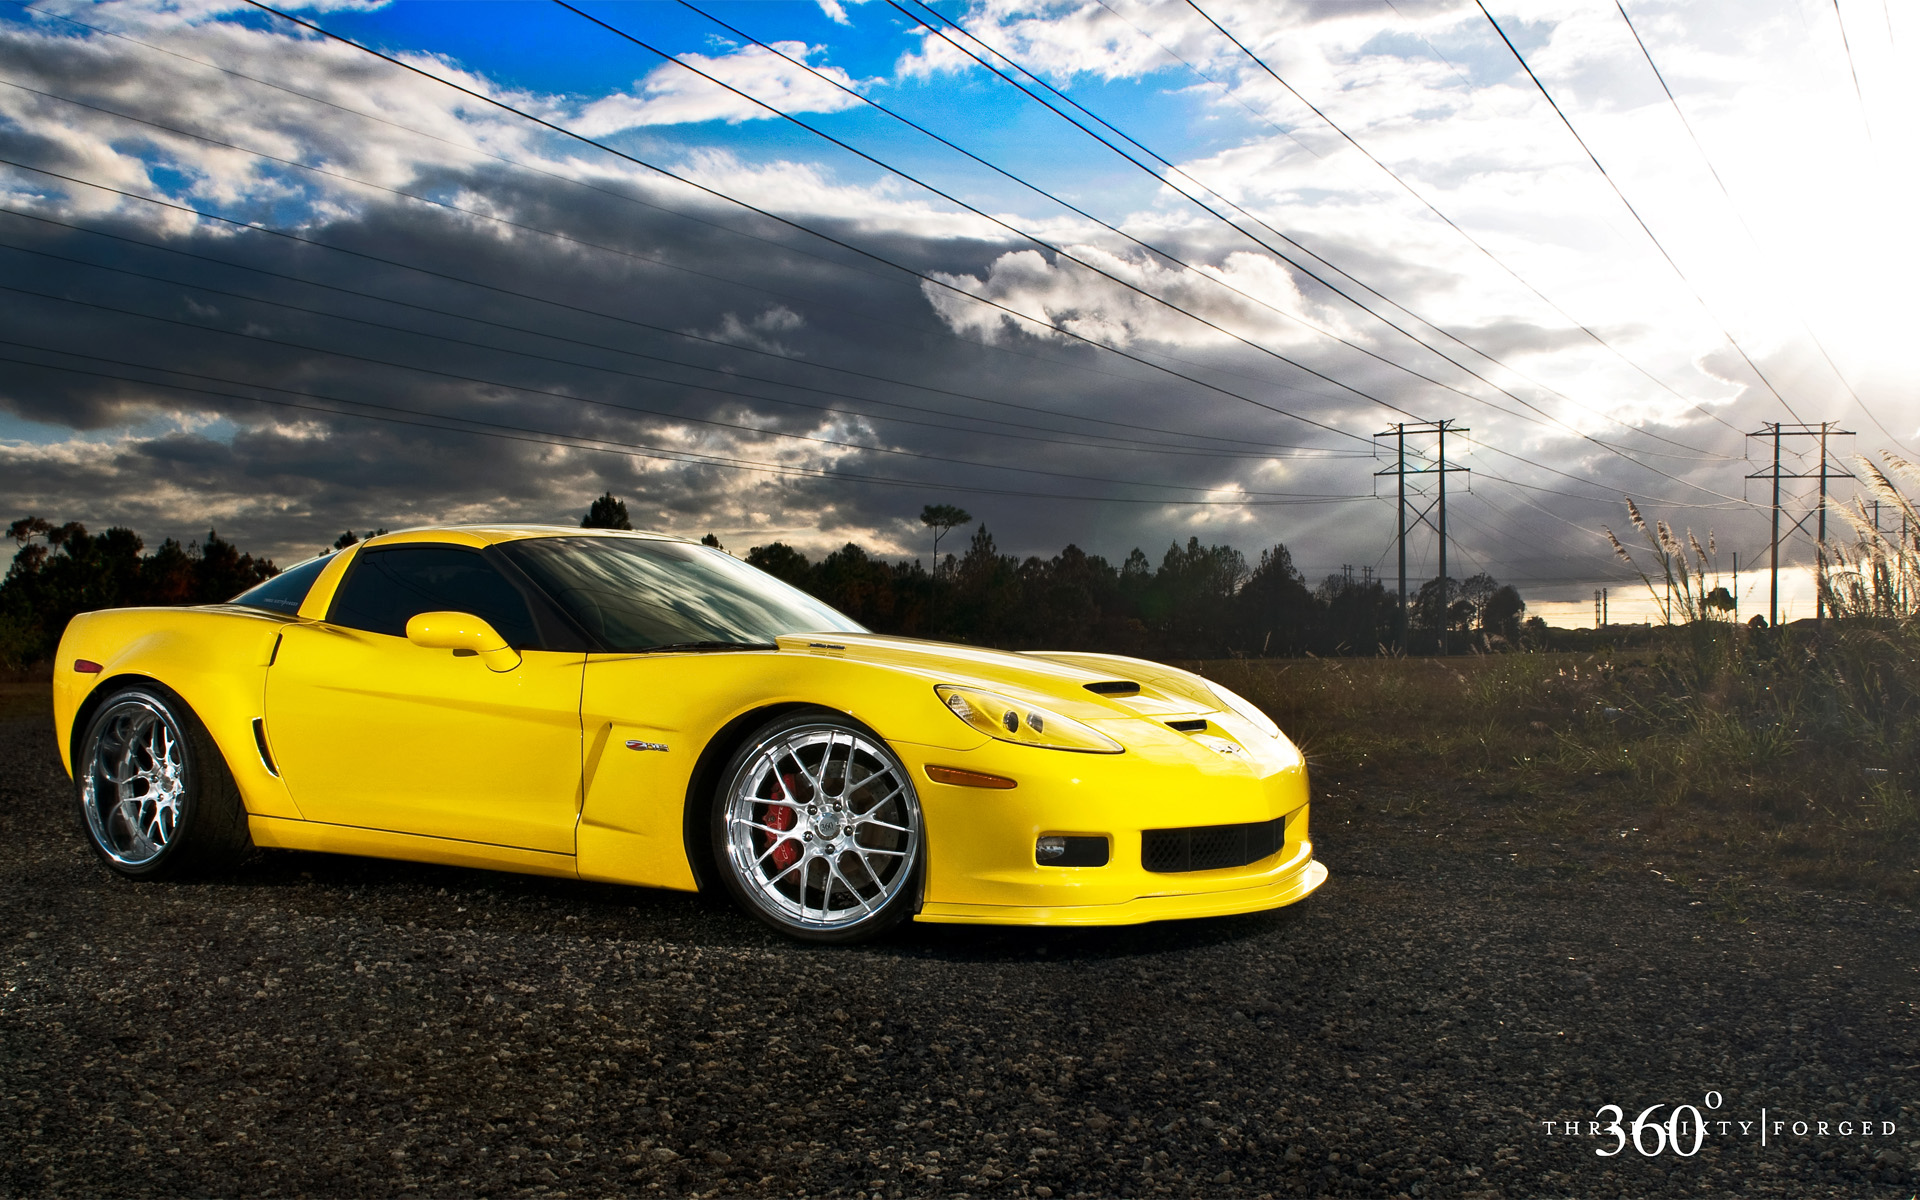 Corvette z06 wallpaper wallpapersafari - Corvette c6 wallpaper ...